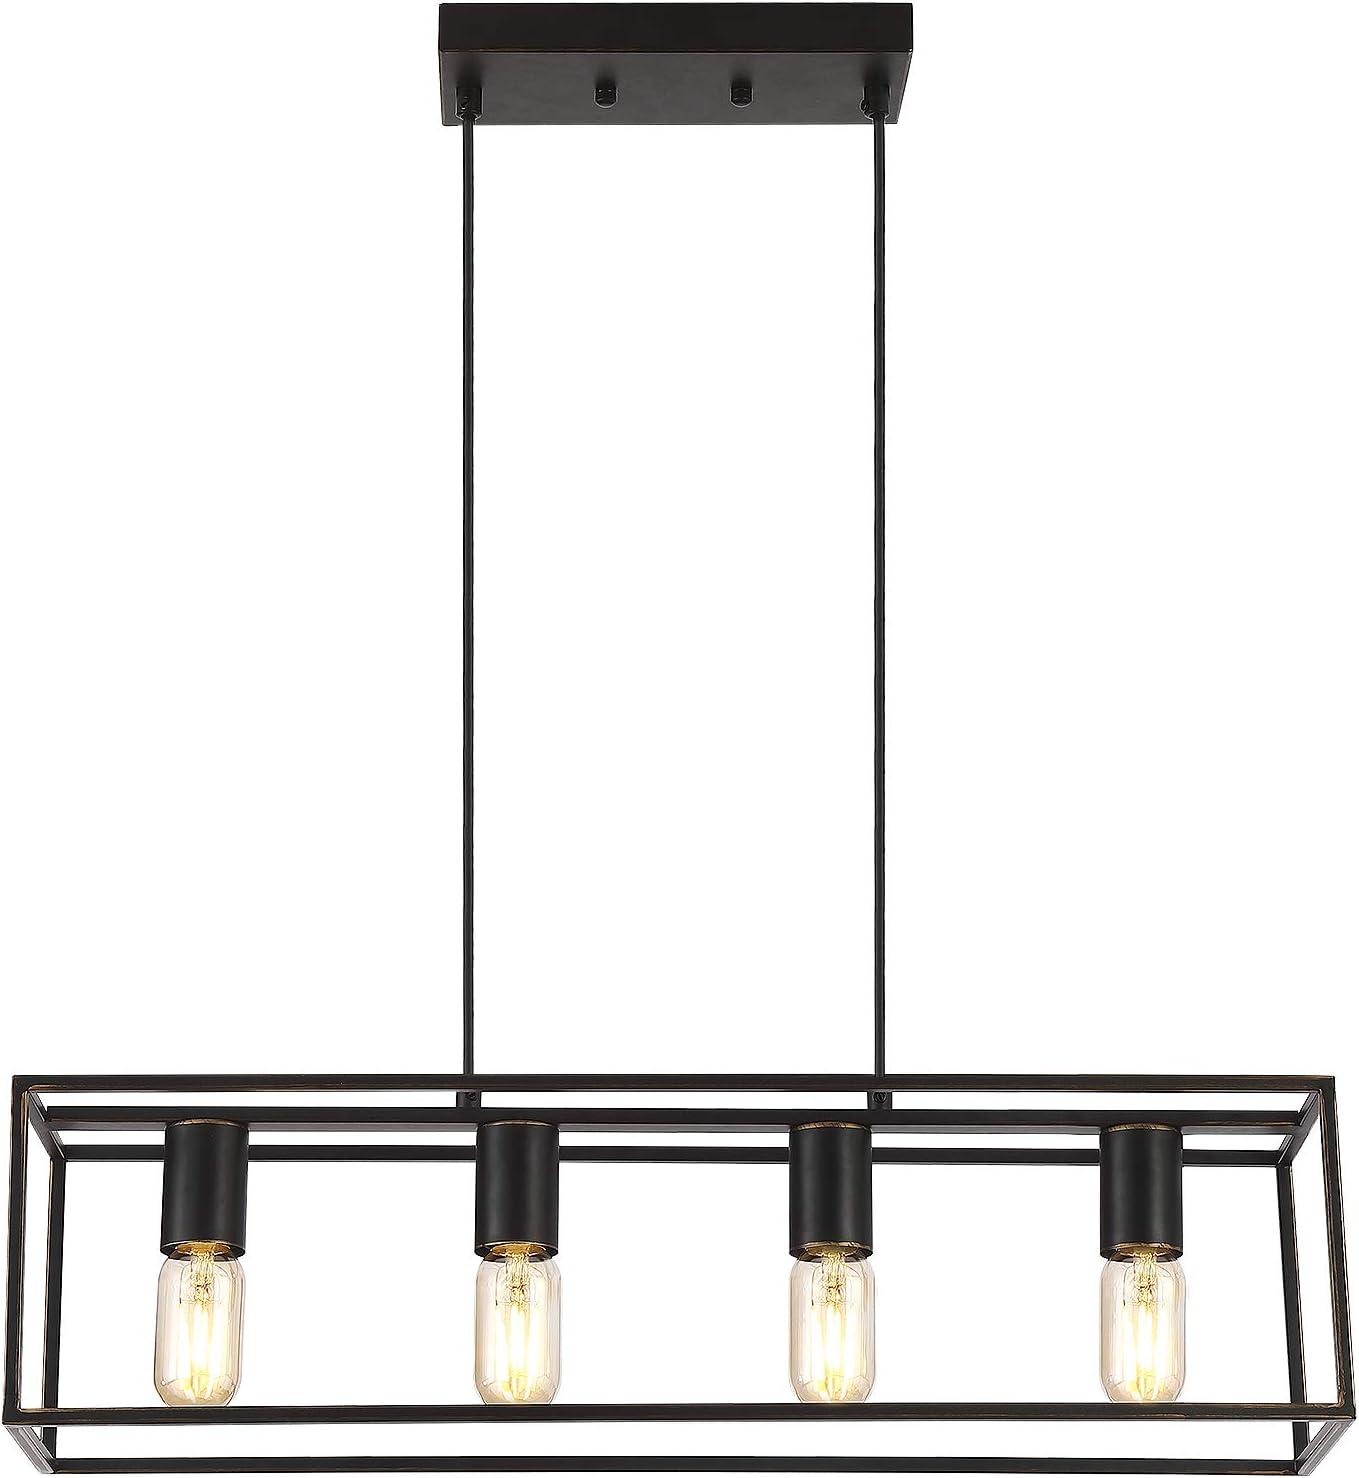 Industrial Linear Pendant Light Fixture, 4-Light Kitchen Island Lighting with Metal Open Frame . (Black+Brushed Gold, 4-Light) - -